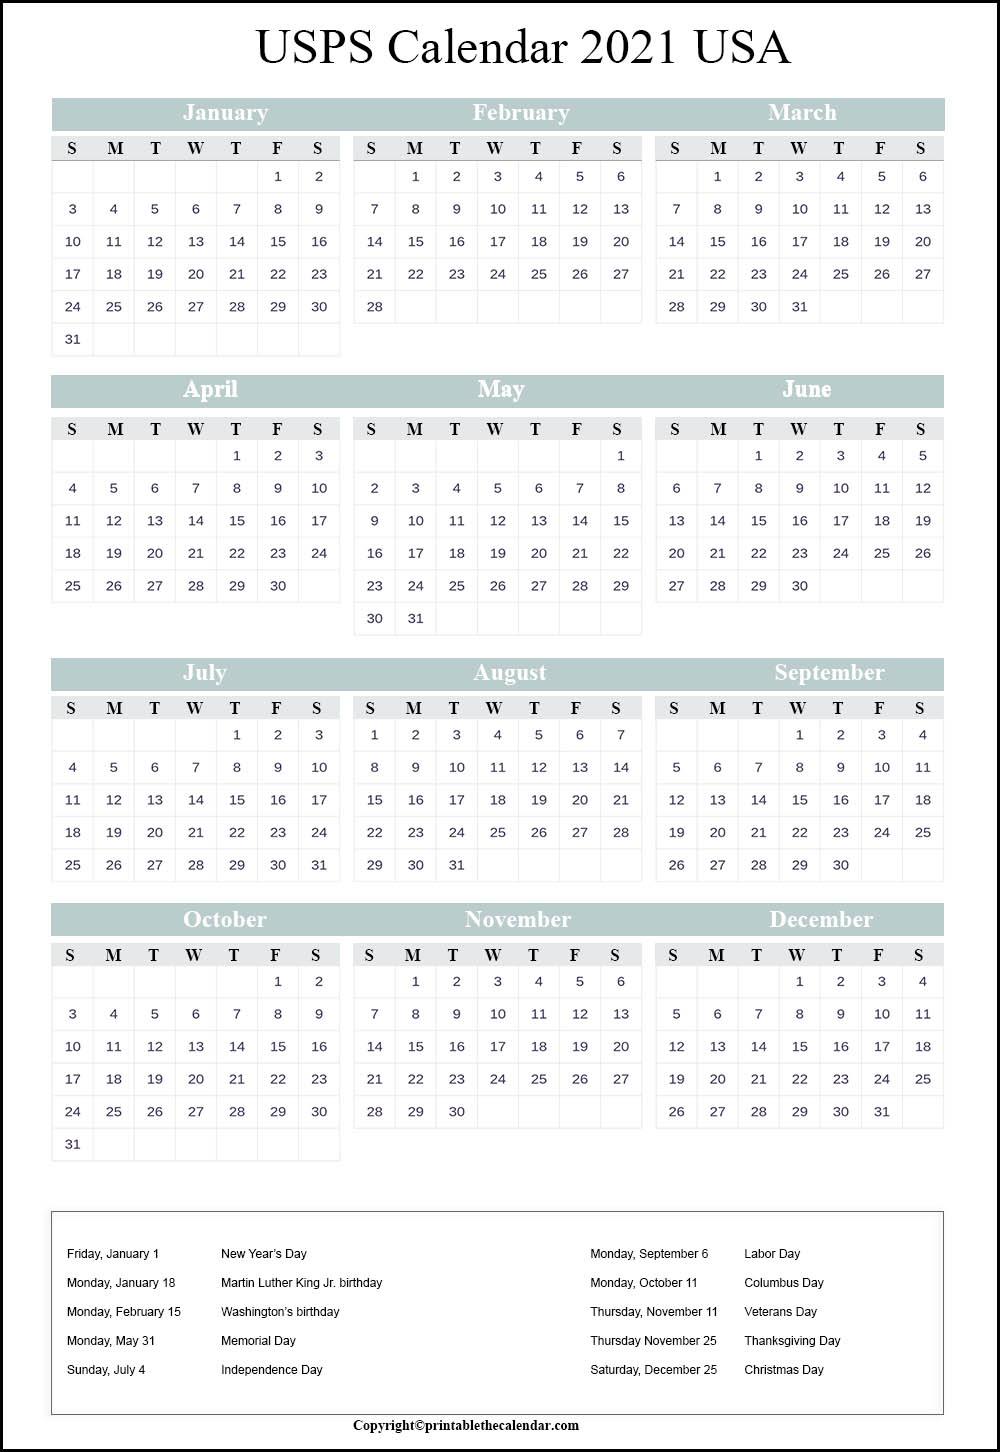 Usps Holiday Schedule 2021 | Usps Calendar 2021 | Printable